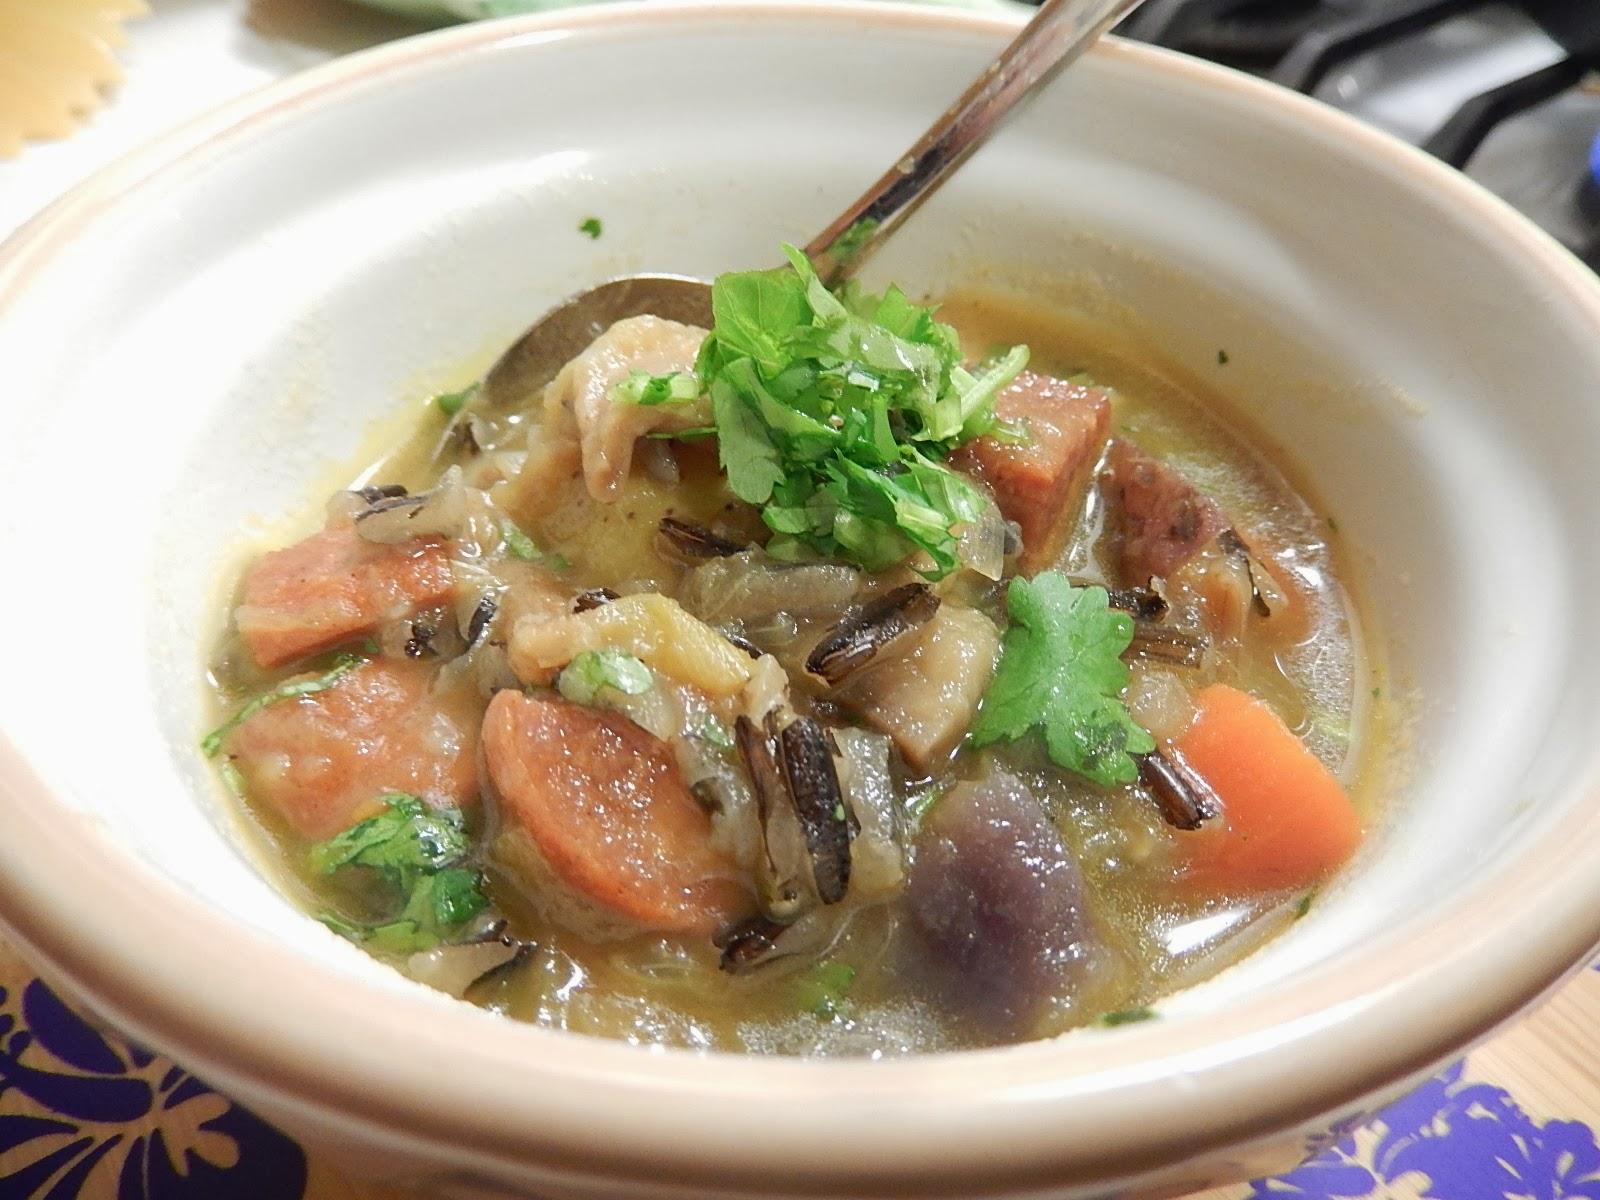 ... cooks!: Hawaiian Portuguese sausage and Minnesotan wild rice Soup